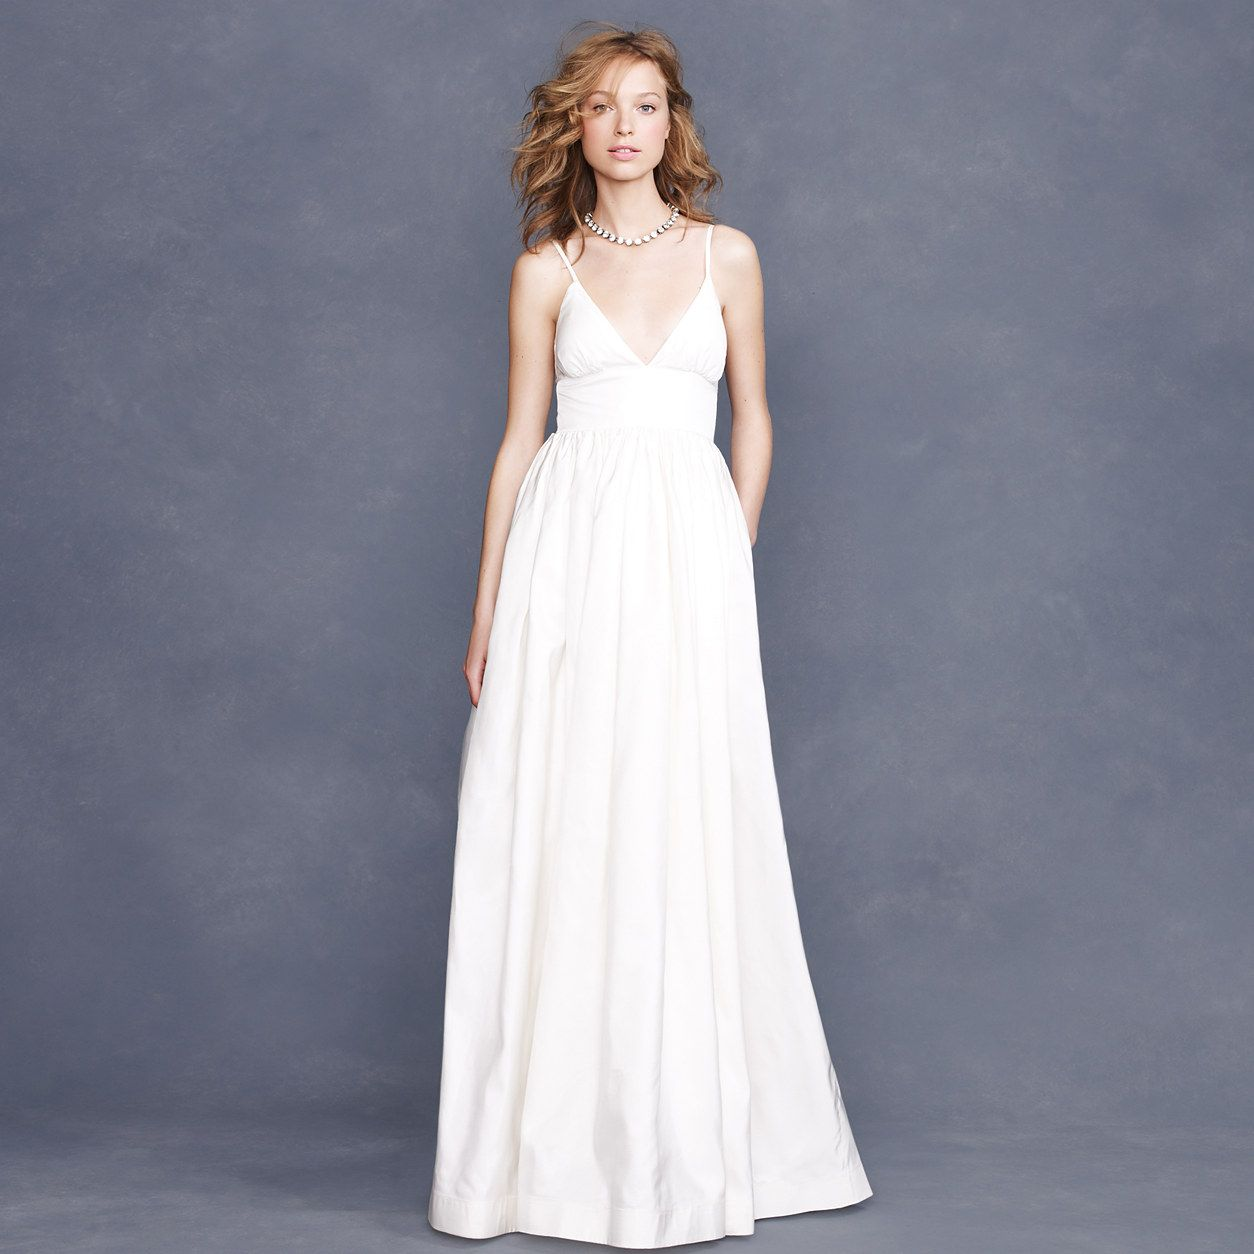 Principessa gown : gowns | J.Crew | Wedding Gowns. | Pinterest ...